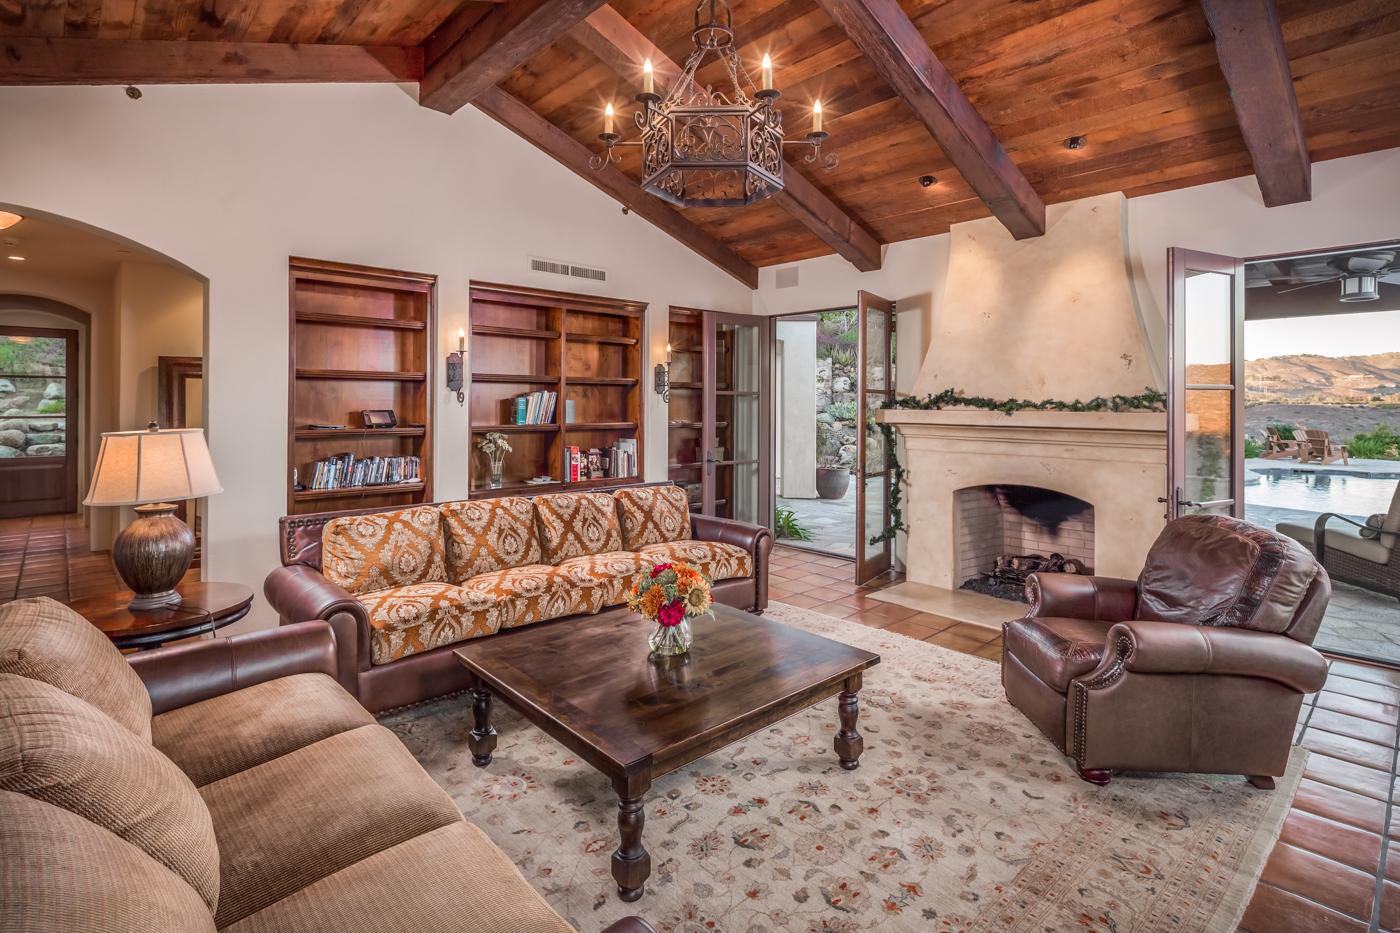 Rancho Santa Fe Covenant, CA 92067